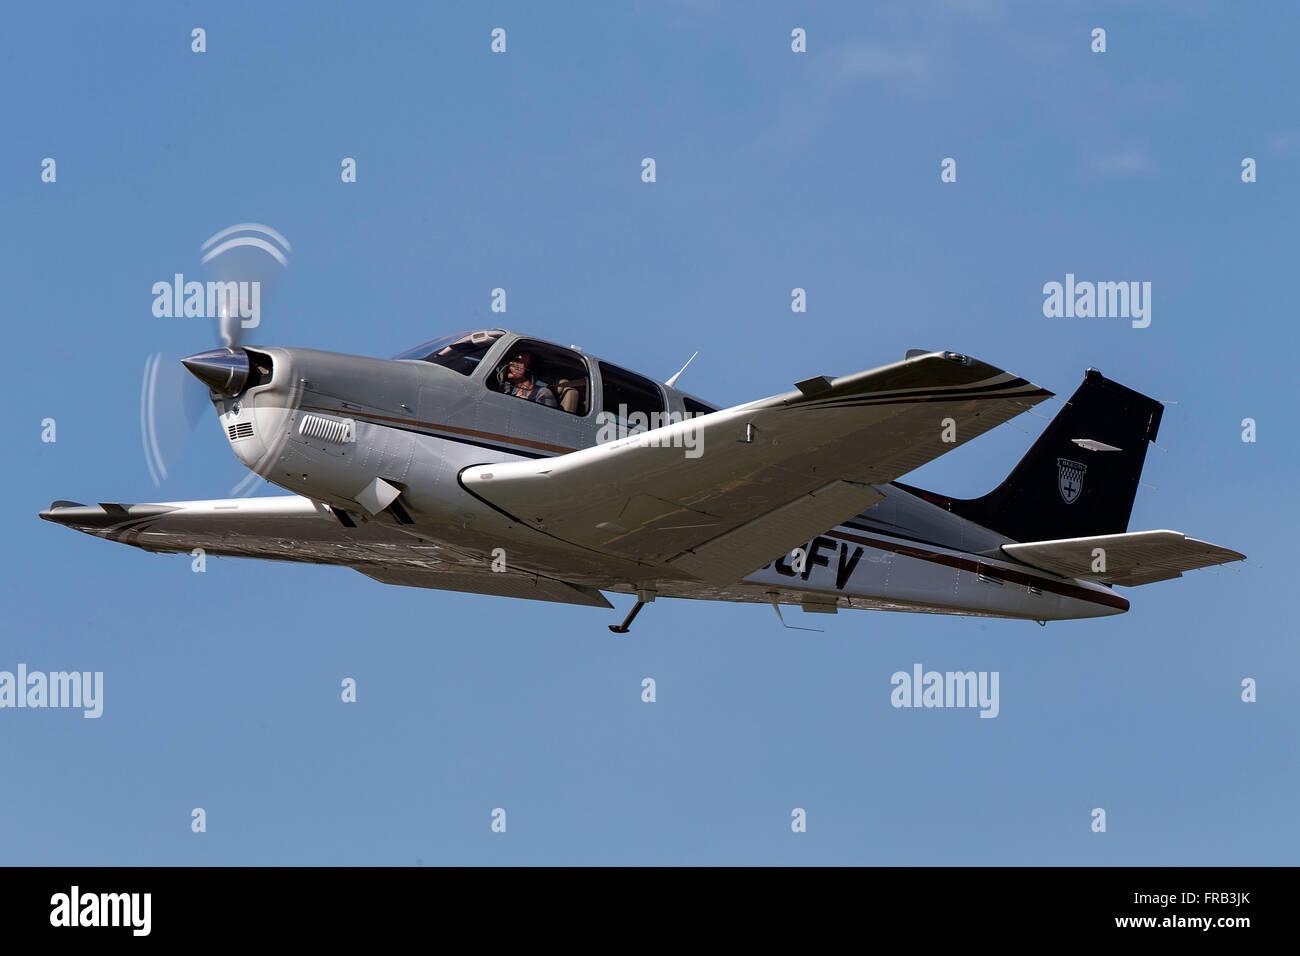 Beechcraft Bonanza G36 (registration N360FV) takes off from Palo Alto Airport (KPAO), Palo Alto, California, United - Stock Image